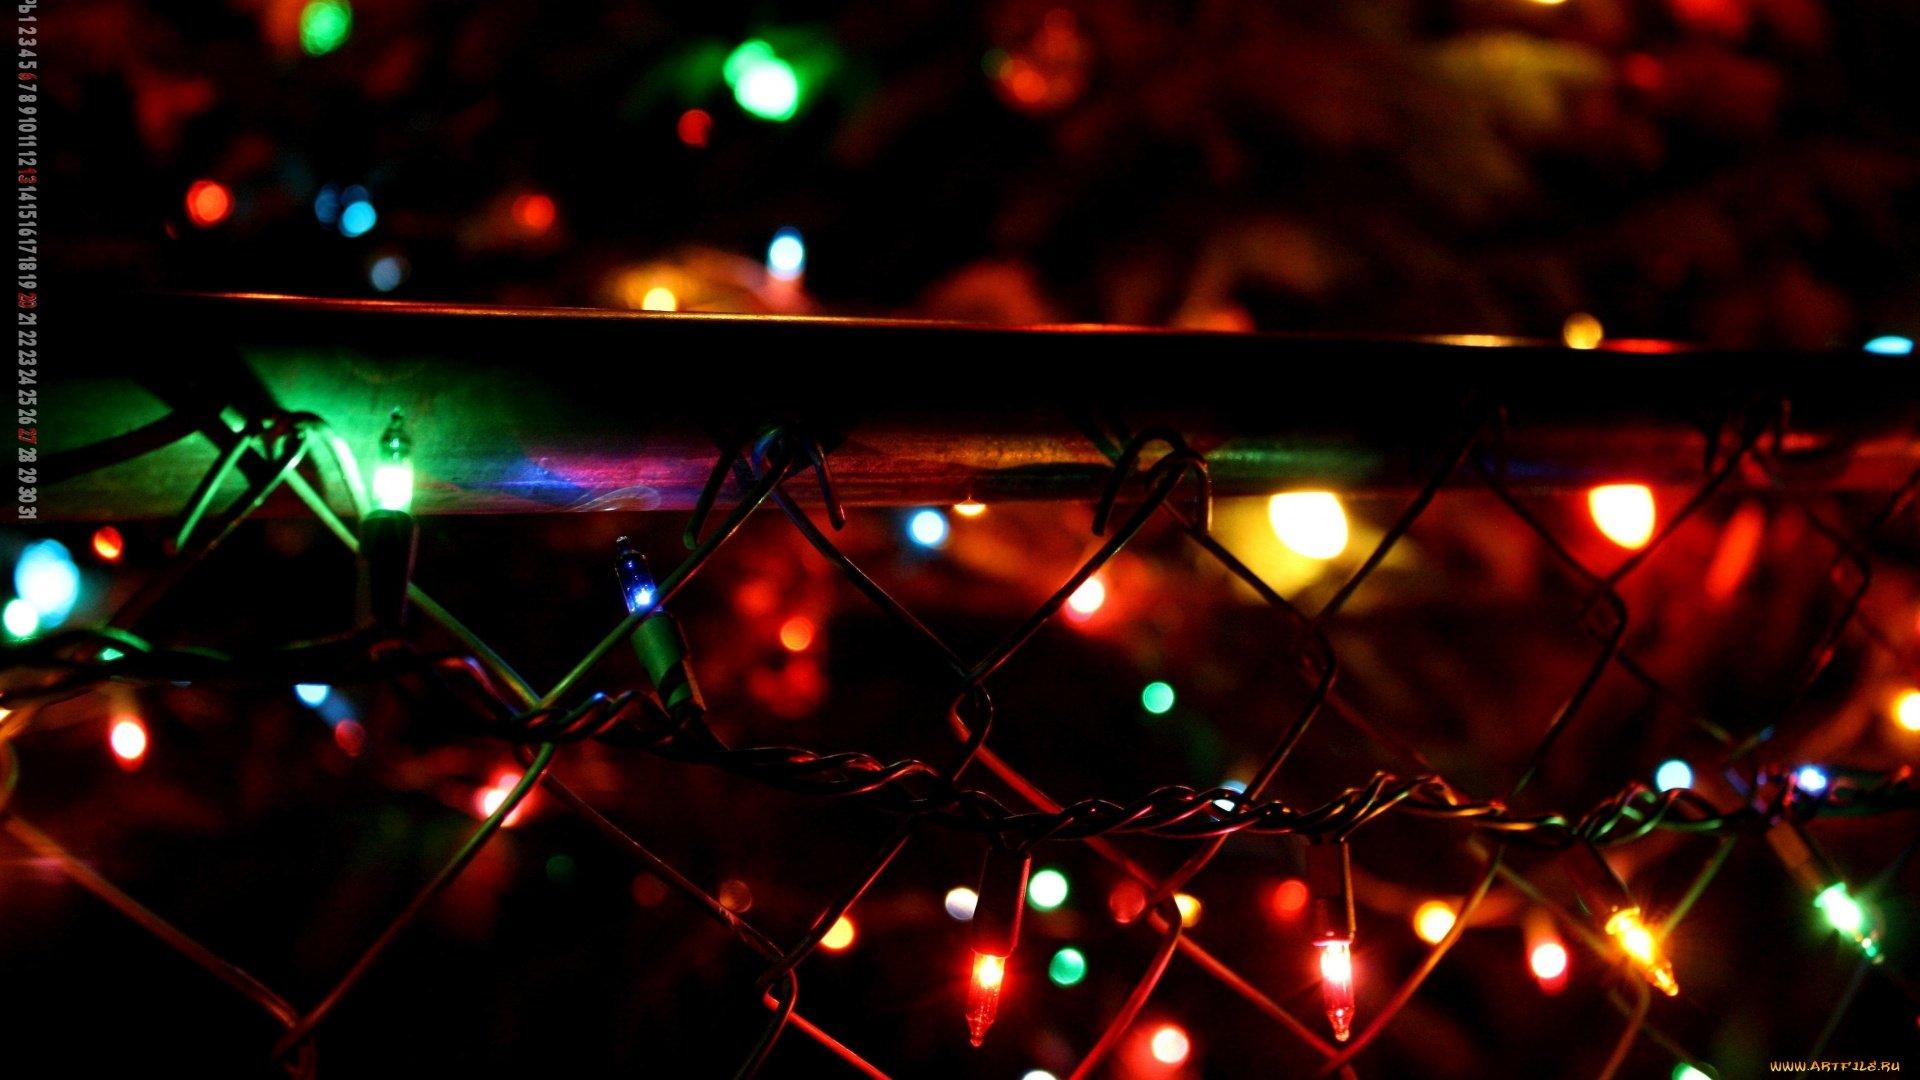 Aesthetic Christmas Background Desktop